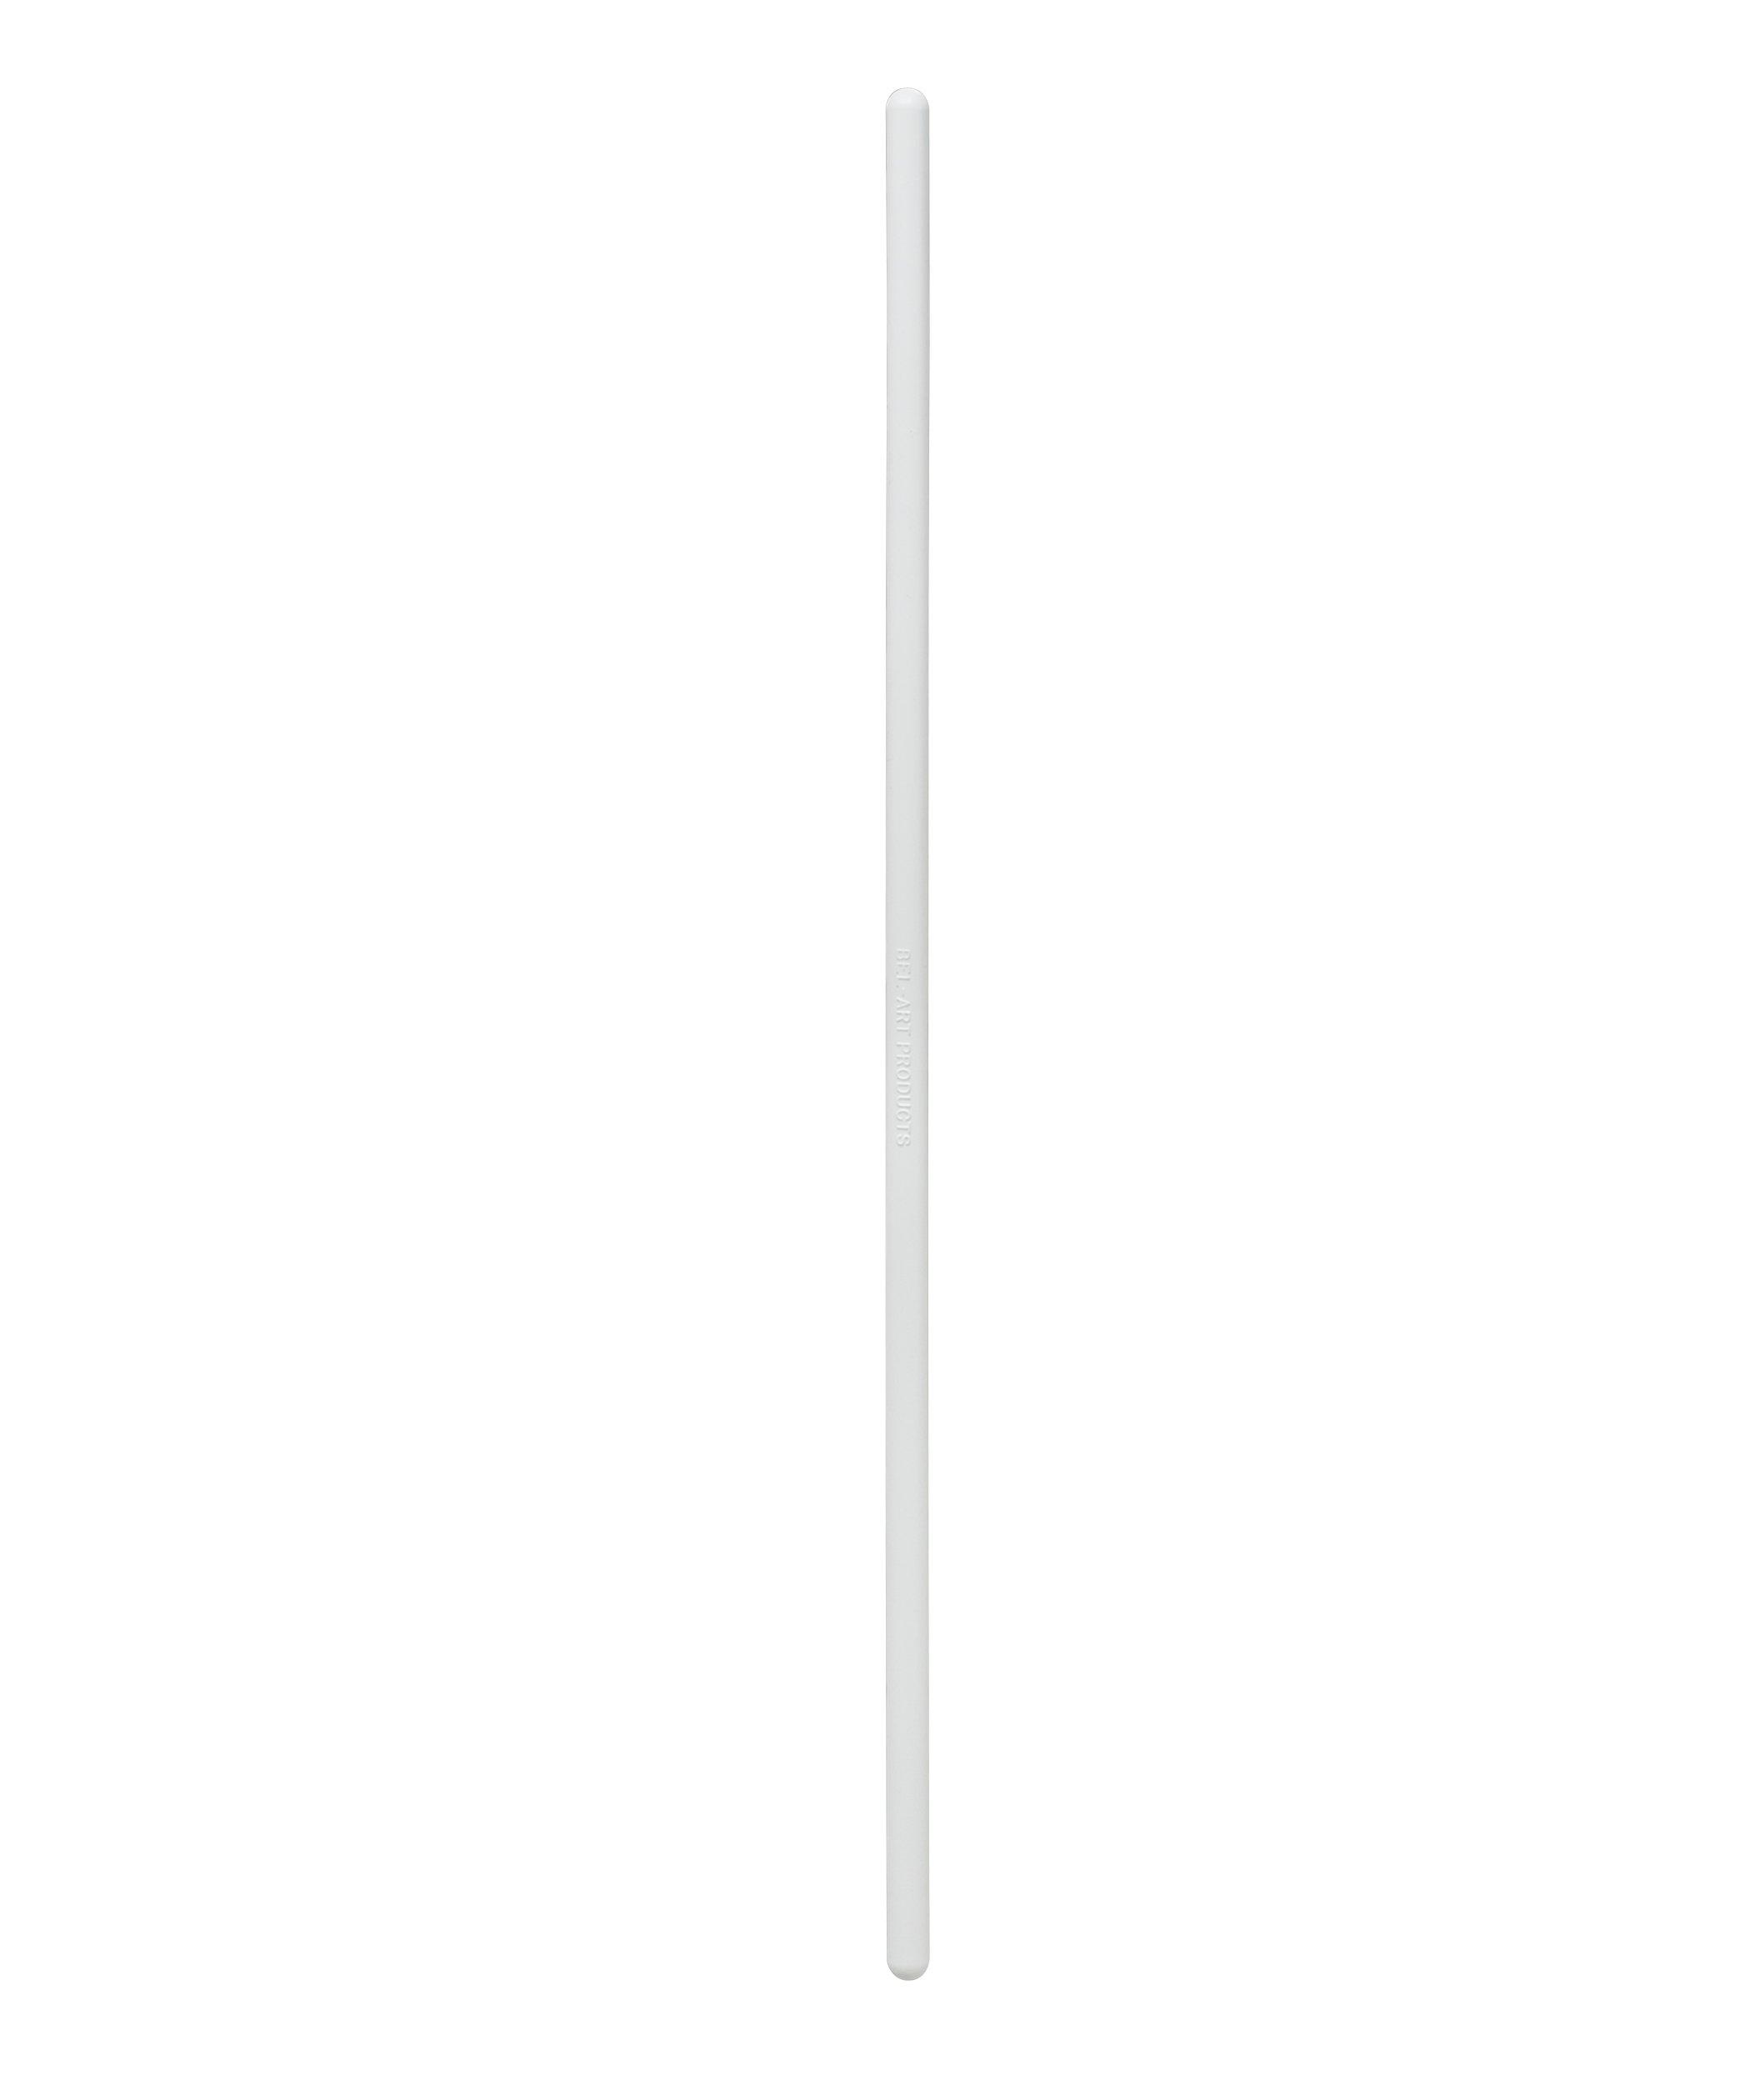 Bel-Art Stirring Rod; 8 in, Plastic (Pack of 6) (F37766-0008) by SP Scienceware